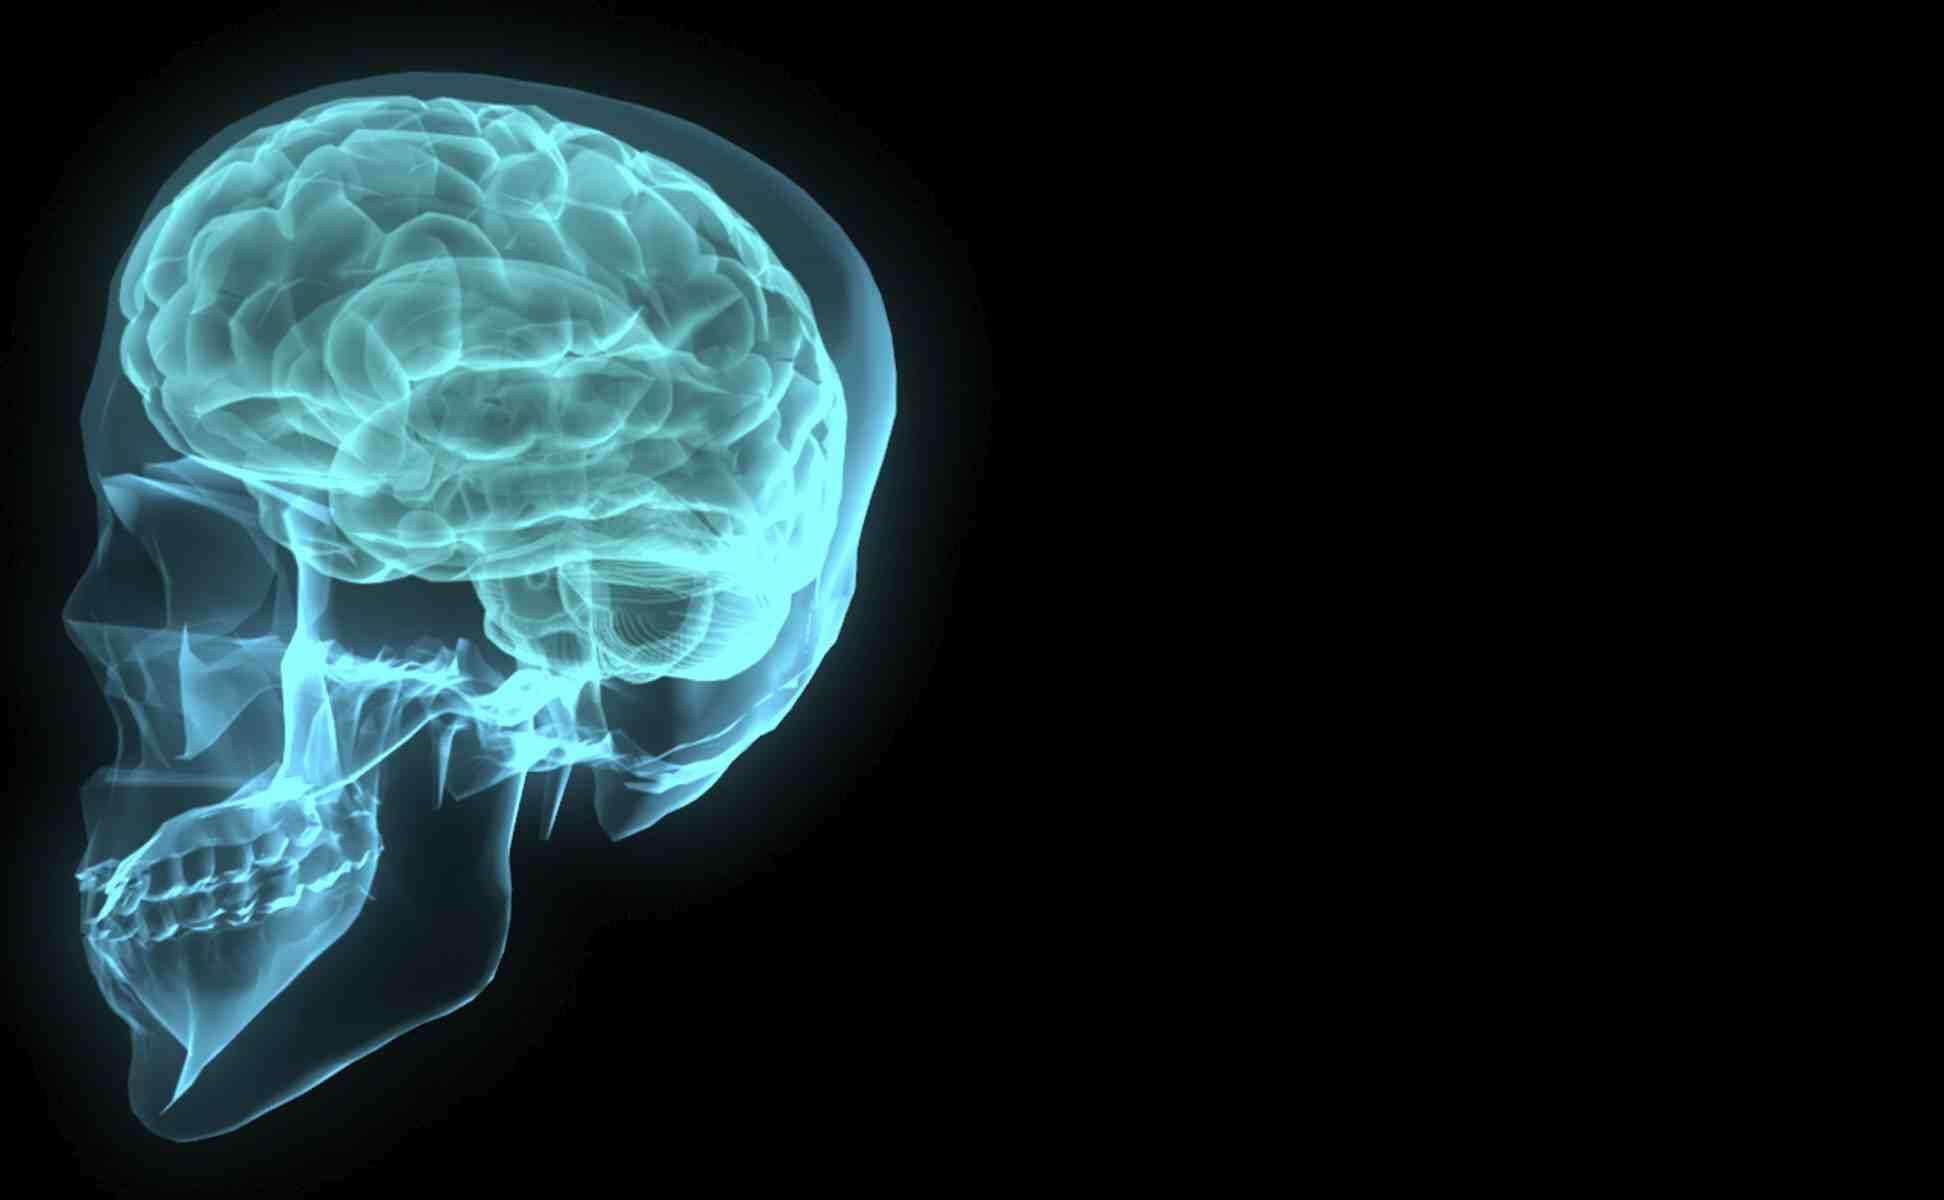 crystal meth brain